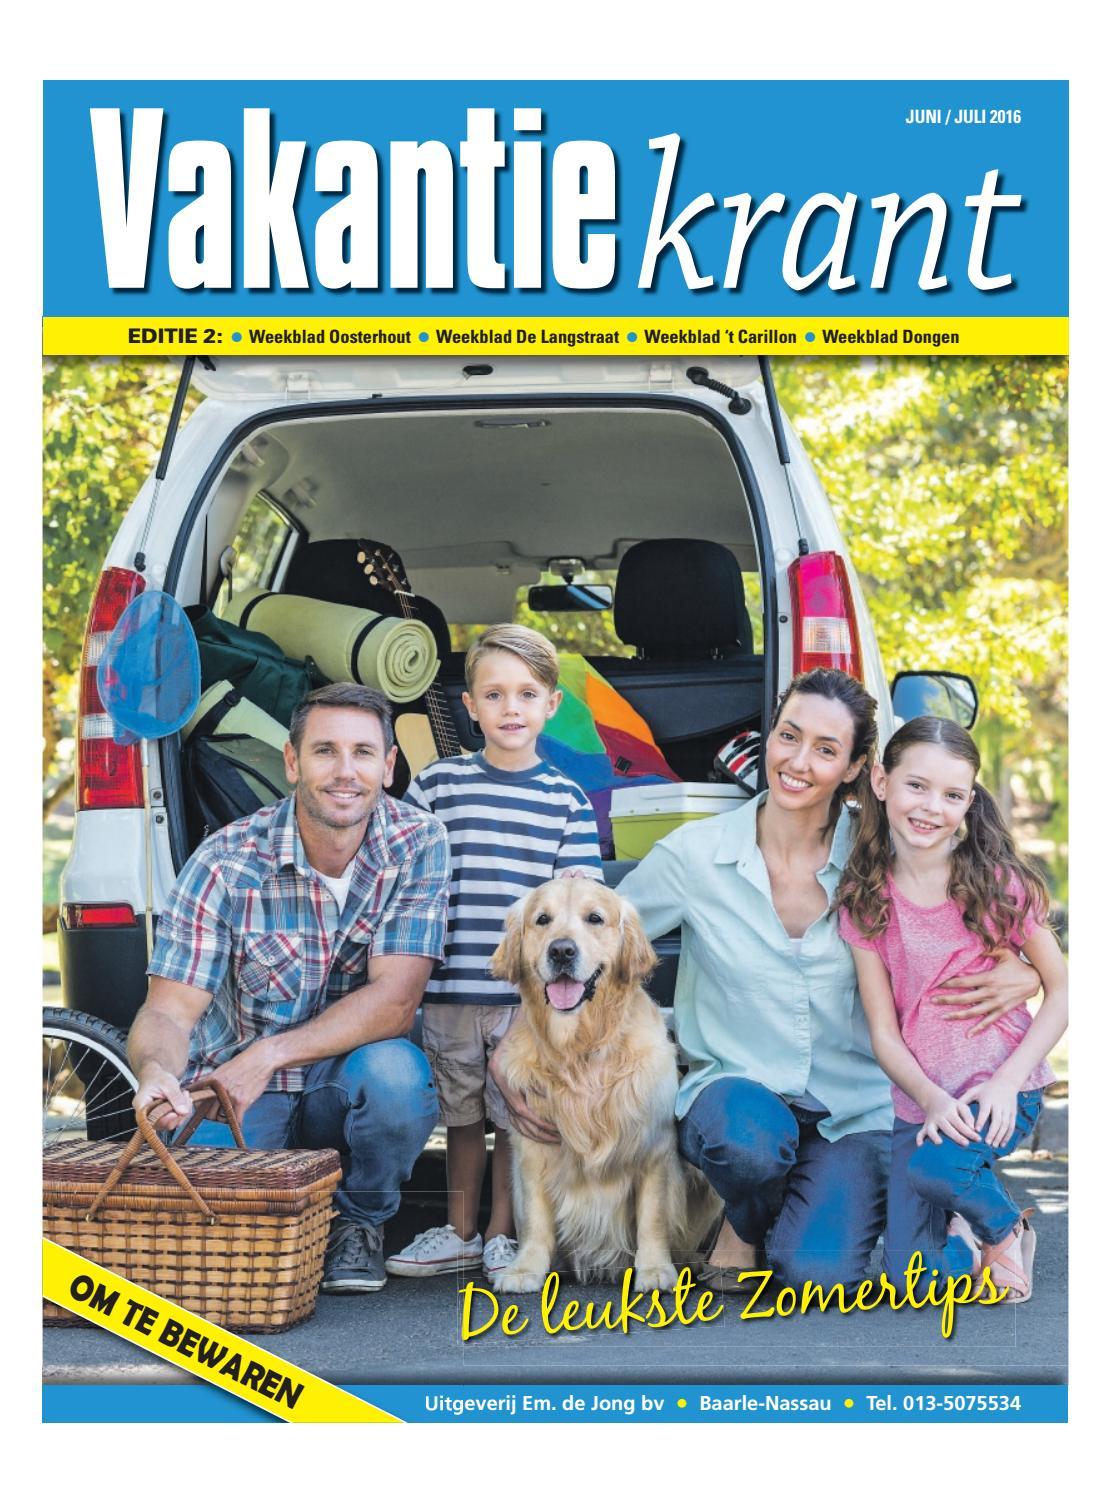 Vakantiekrant ed 2 22 06 2016 by uitgeverij em de jong for Nassau indus deur bv oosterhout